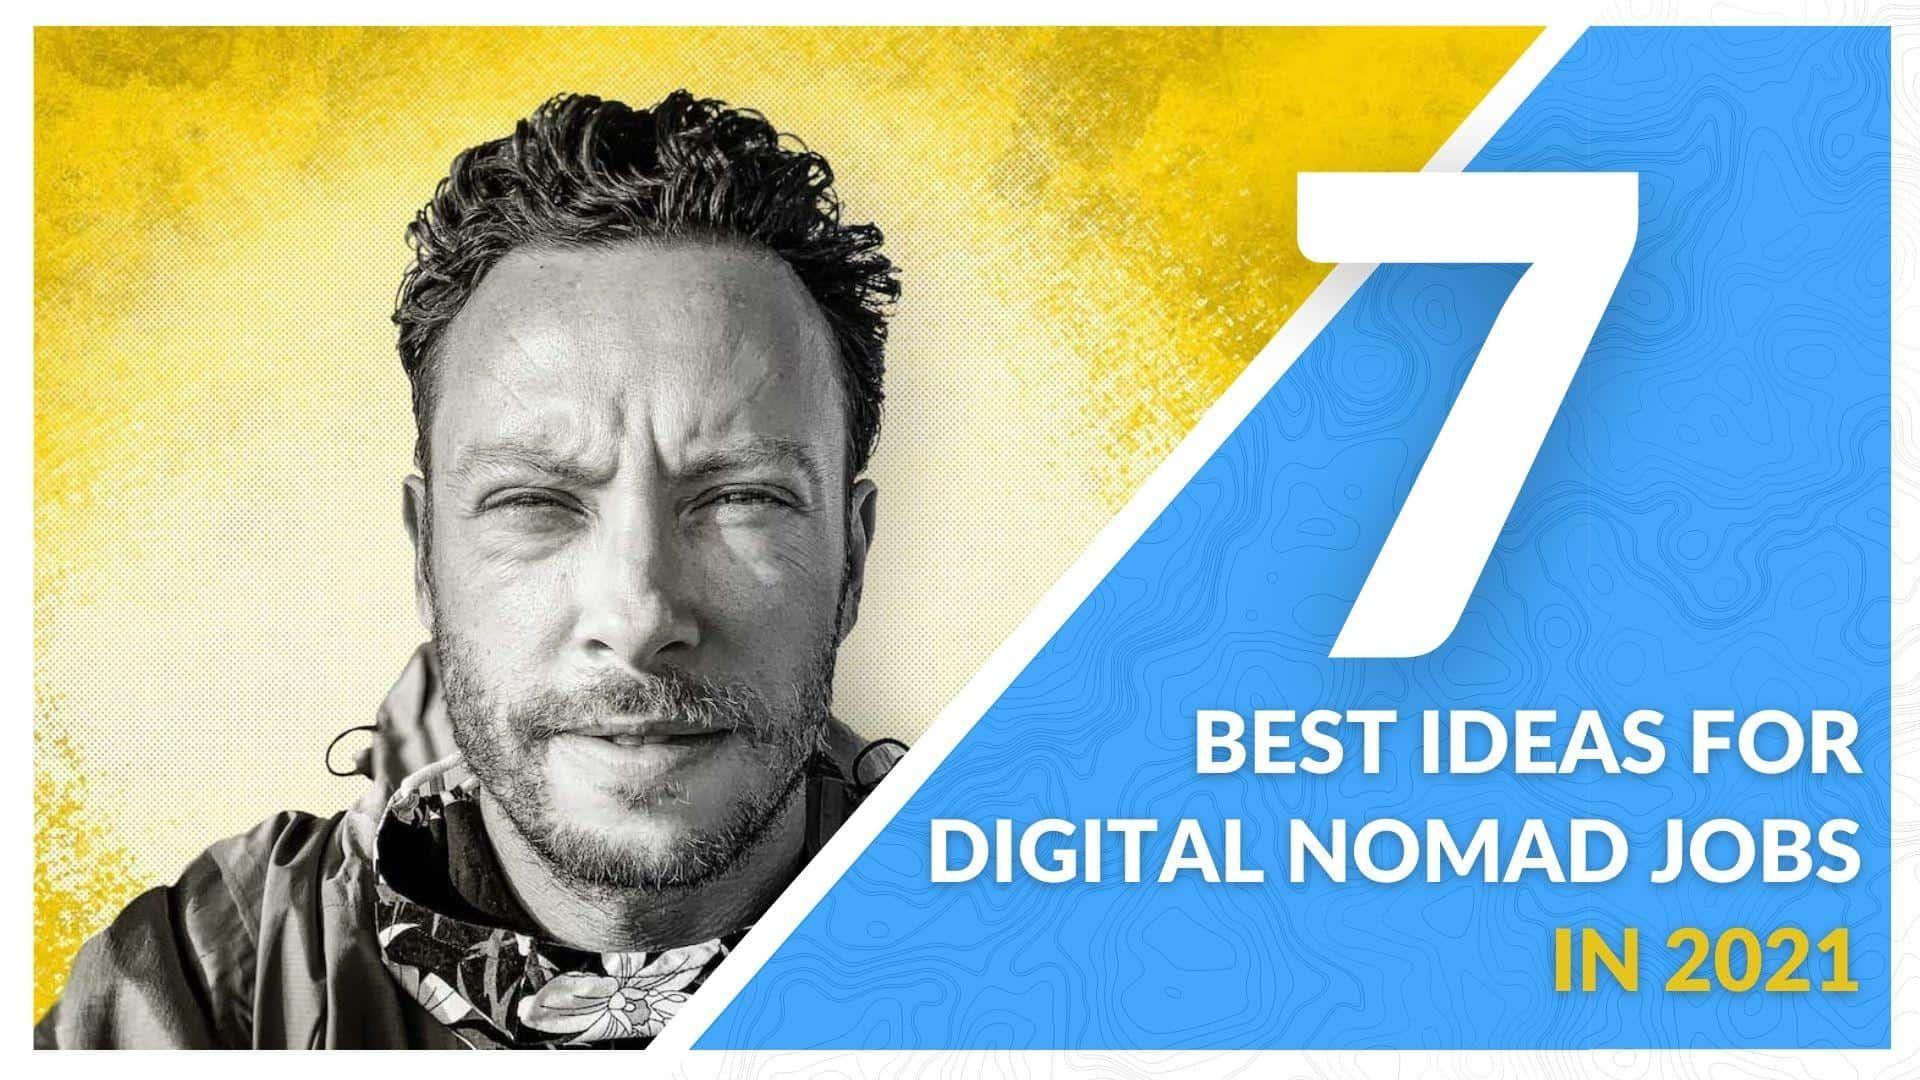 The 7 best jobs for digital nomads